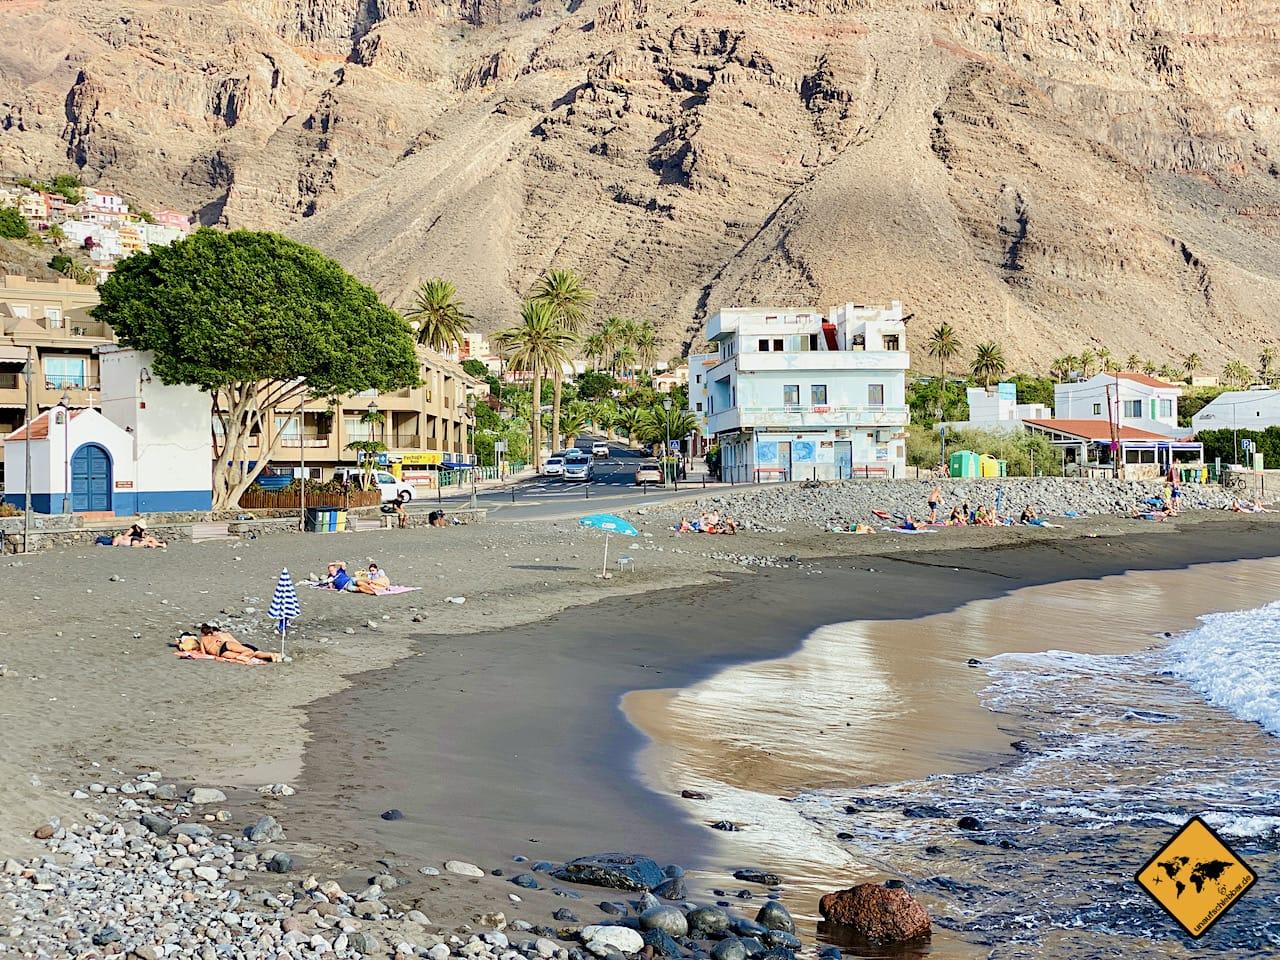 Urlaubsort Valle Gran Rey La Gomera Kanaren